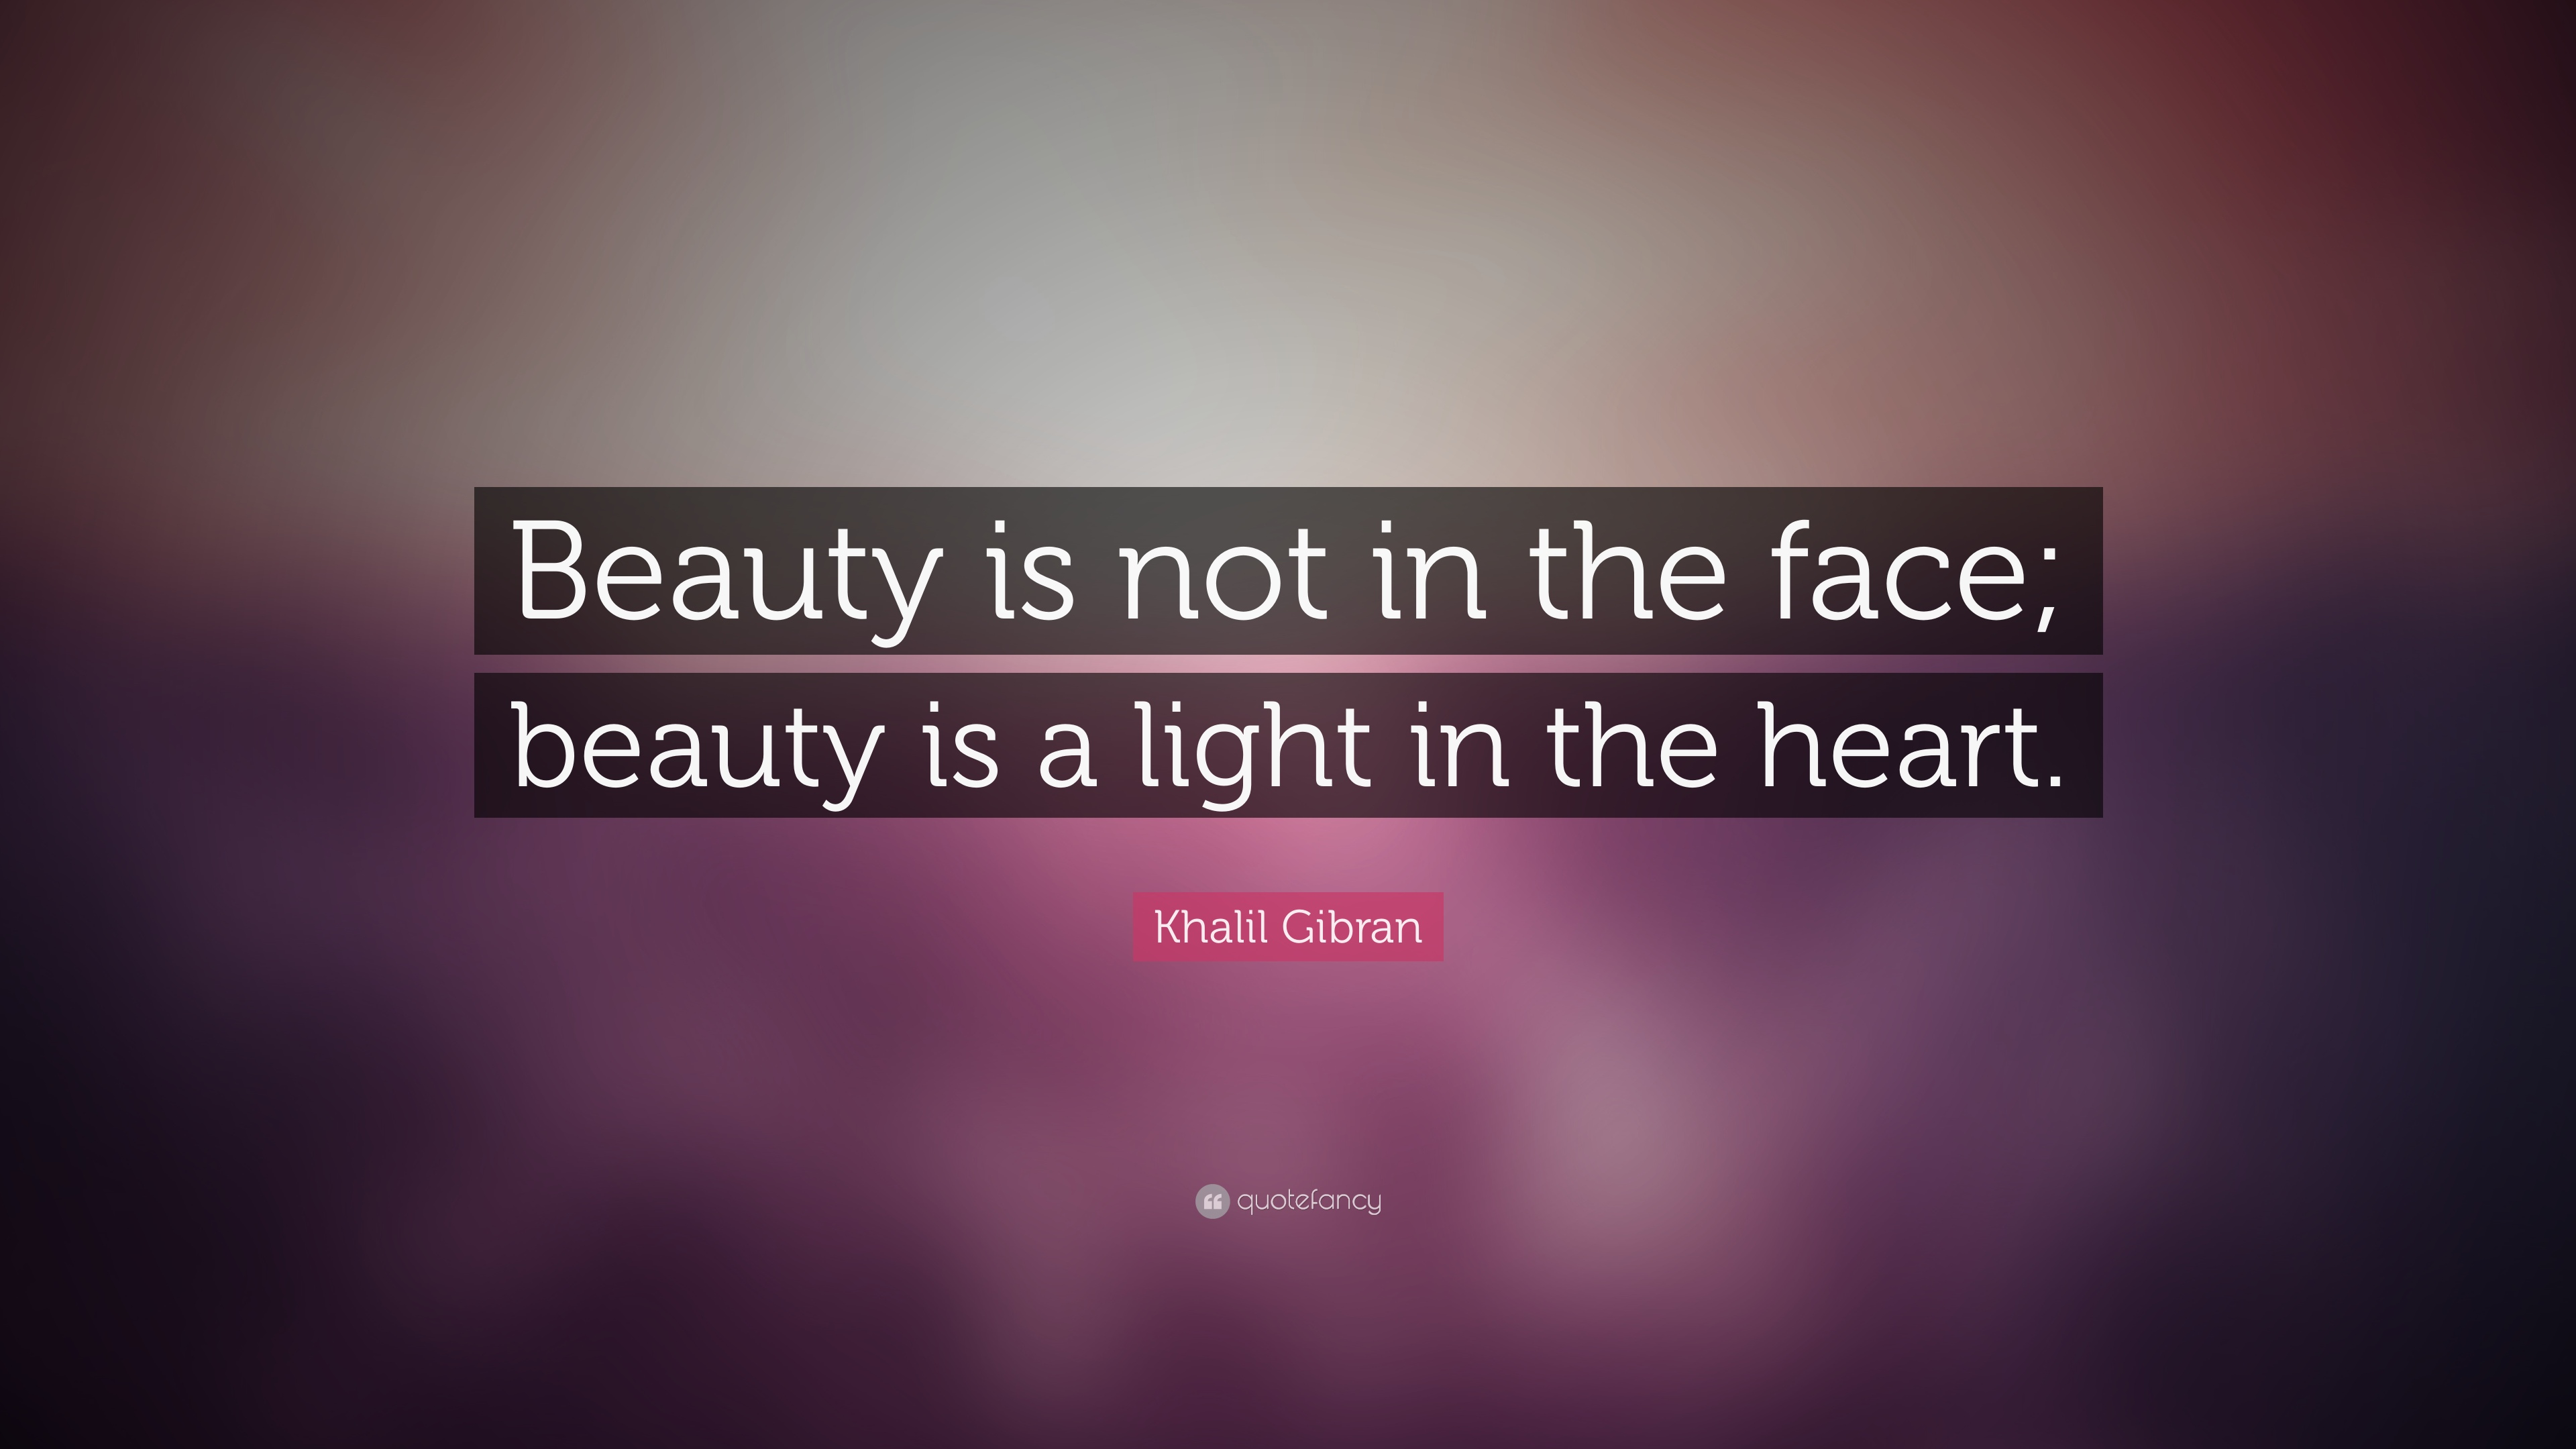 Khalil Gibran Quote Desktop Wallpaper Beauty Quotes 30 Wallpapers Quotefancy